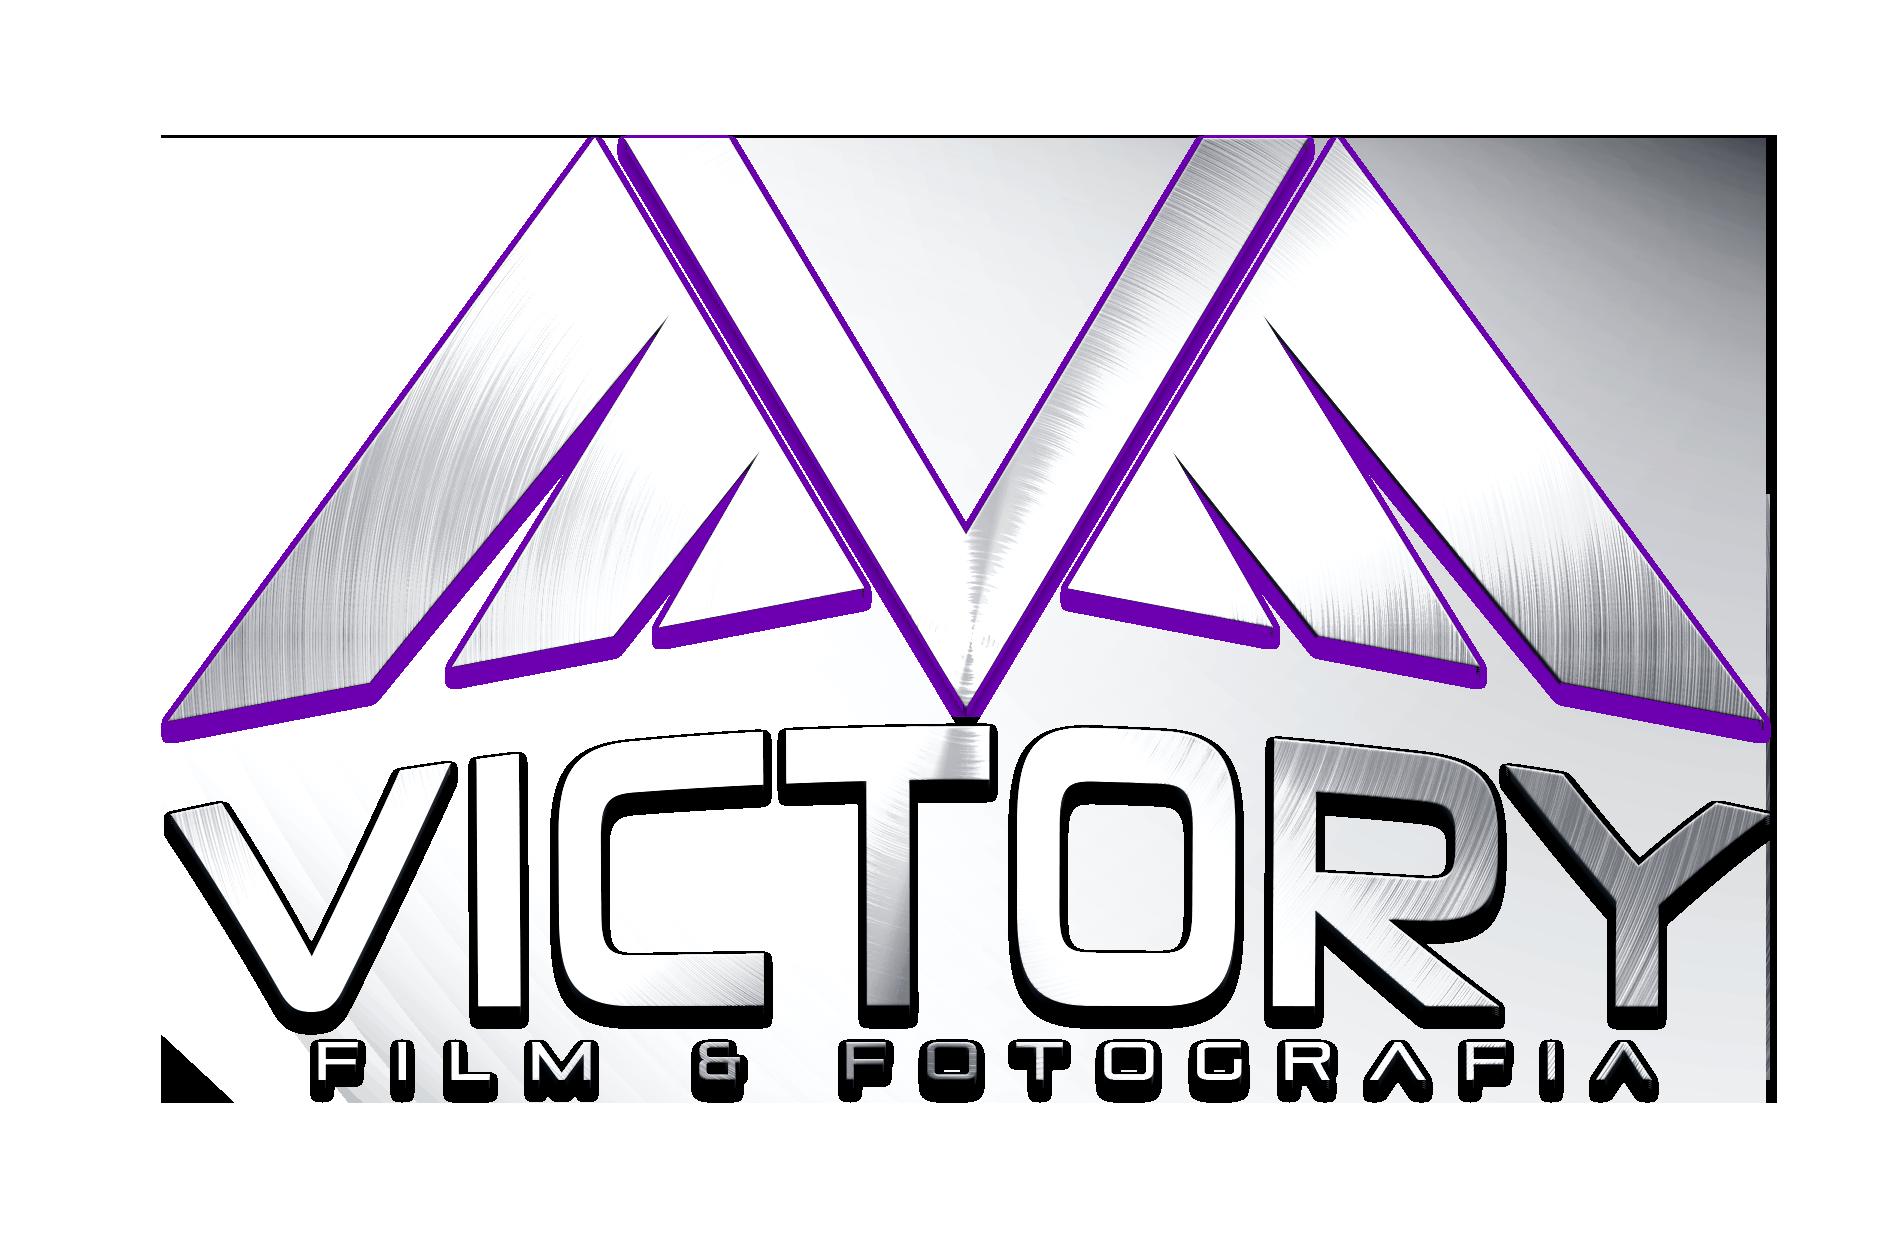 Victory studio Film i Fotografia